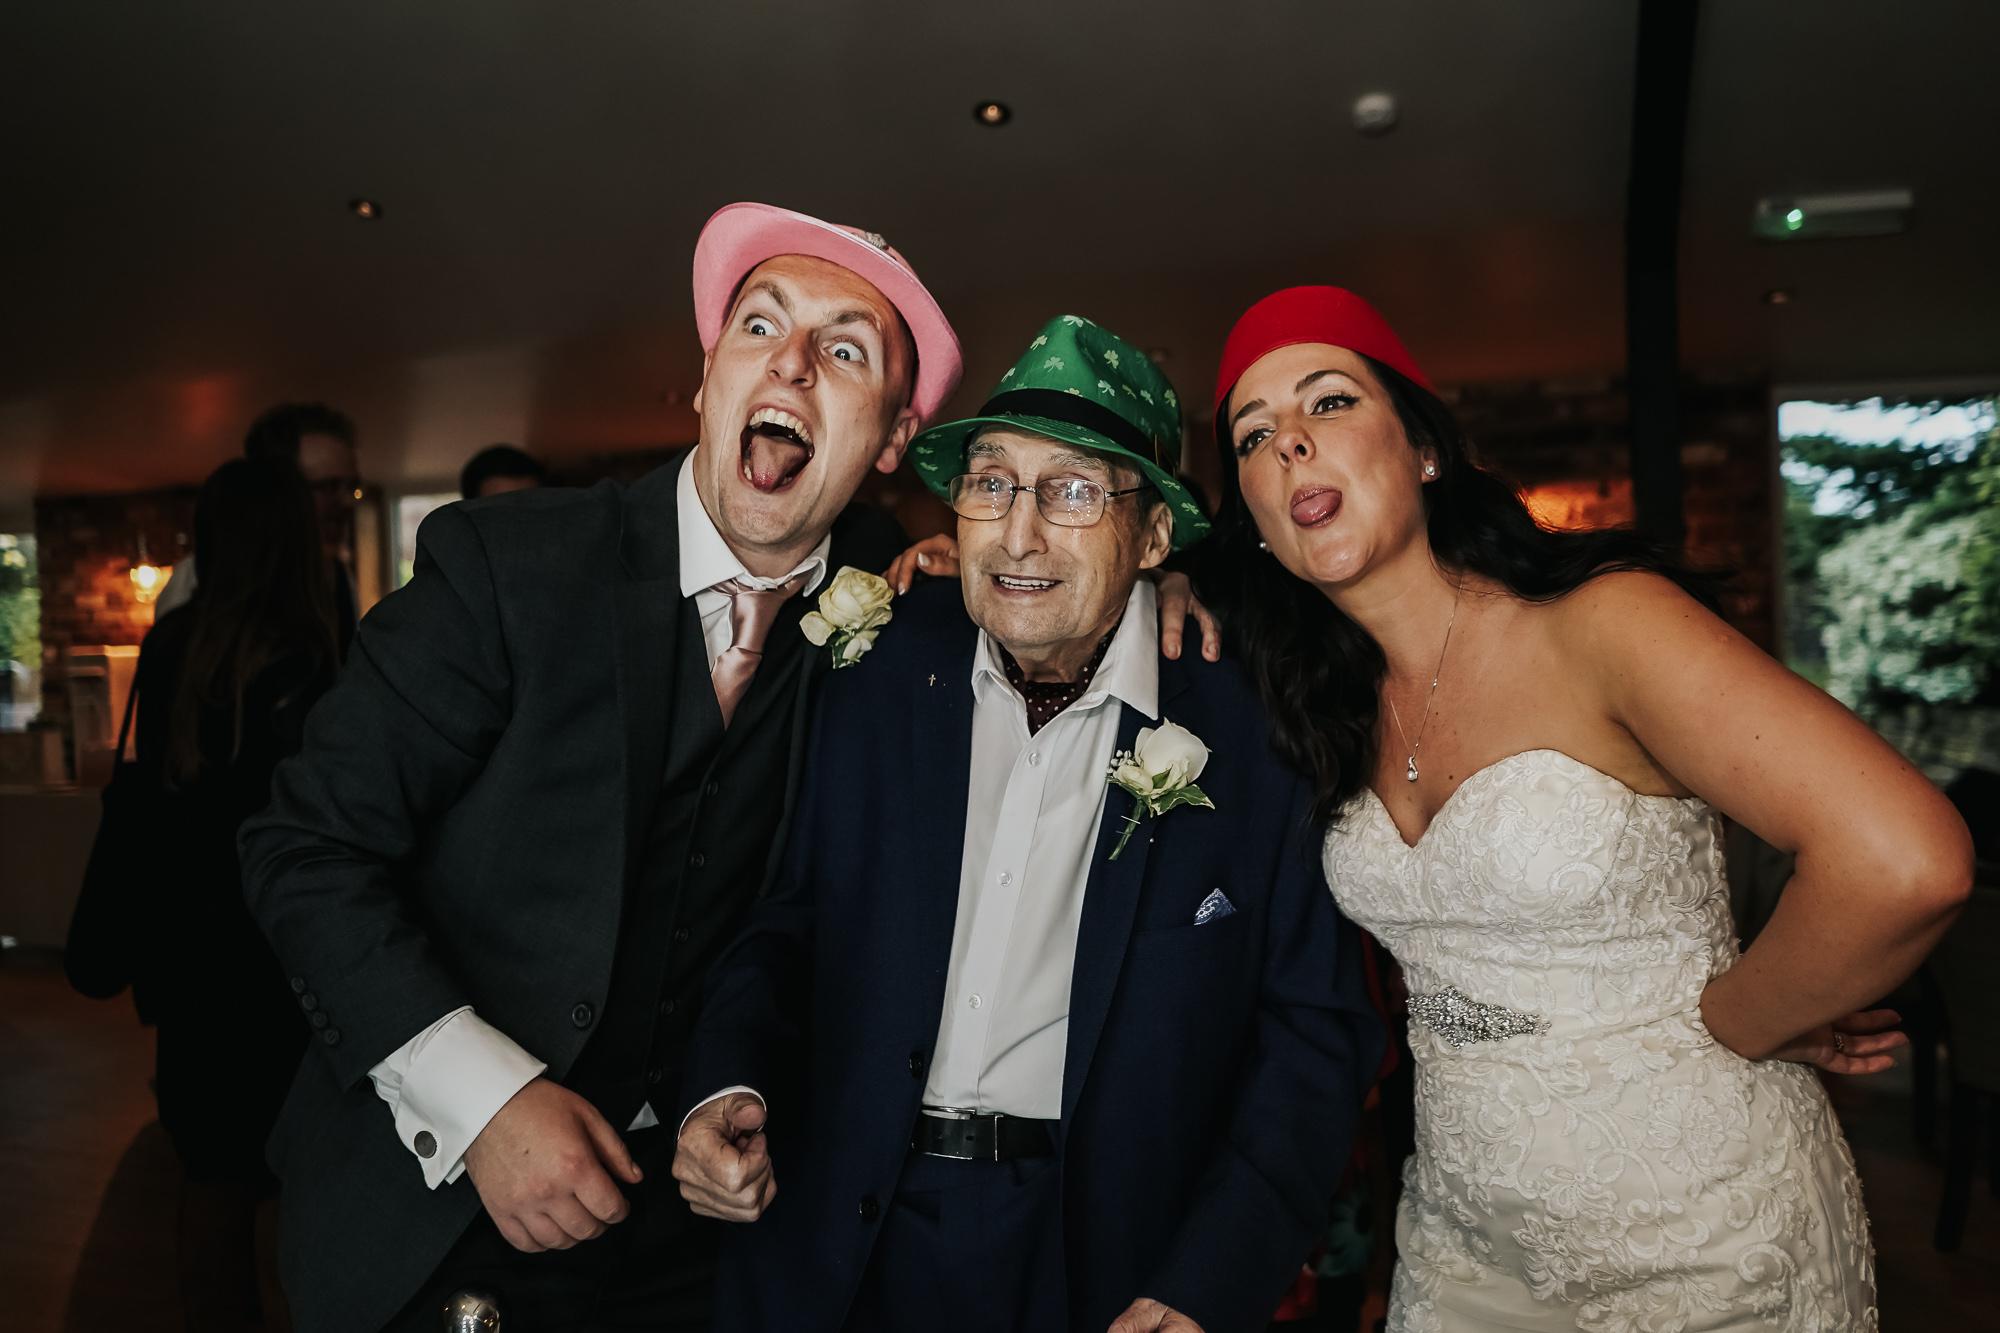 Hyde Bank Farm Wedding Photography Manchester wedding photographer (49 of 49).jpg